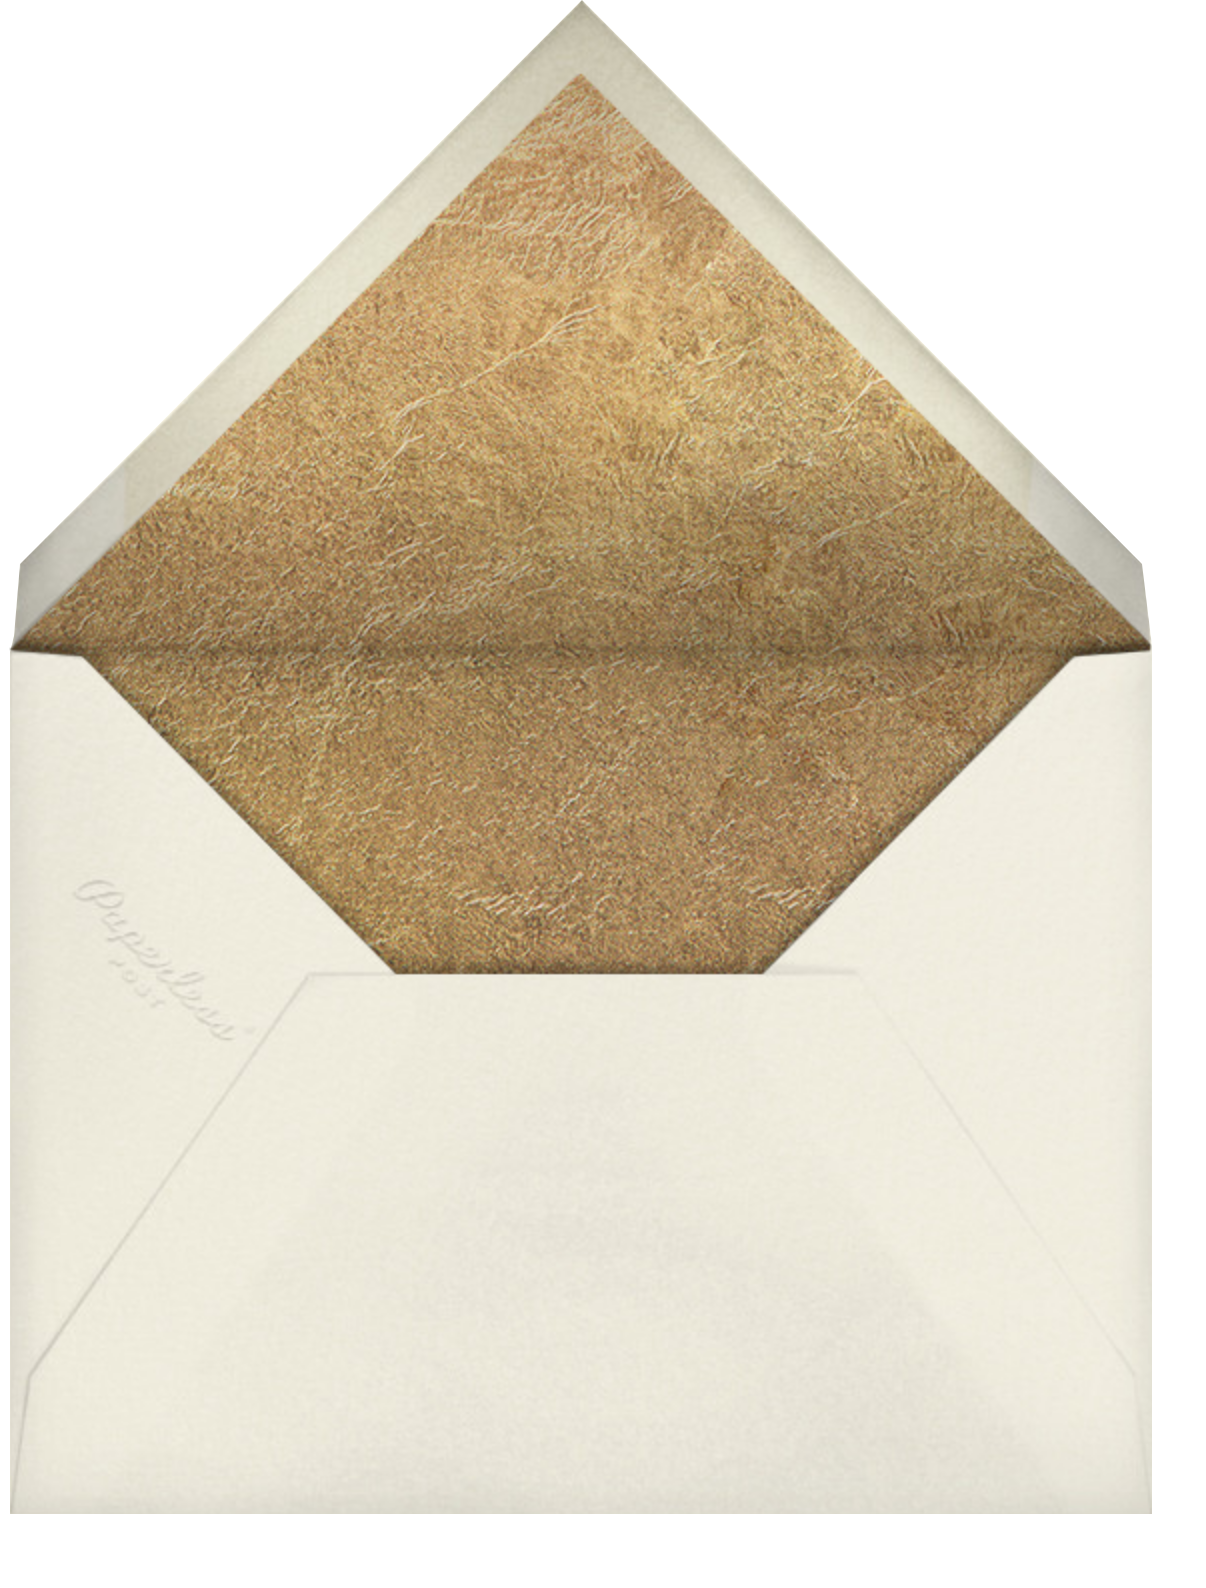 Inlay - Antique Pink - Kelly Wearstler - Adult birthday - envelope back